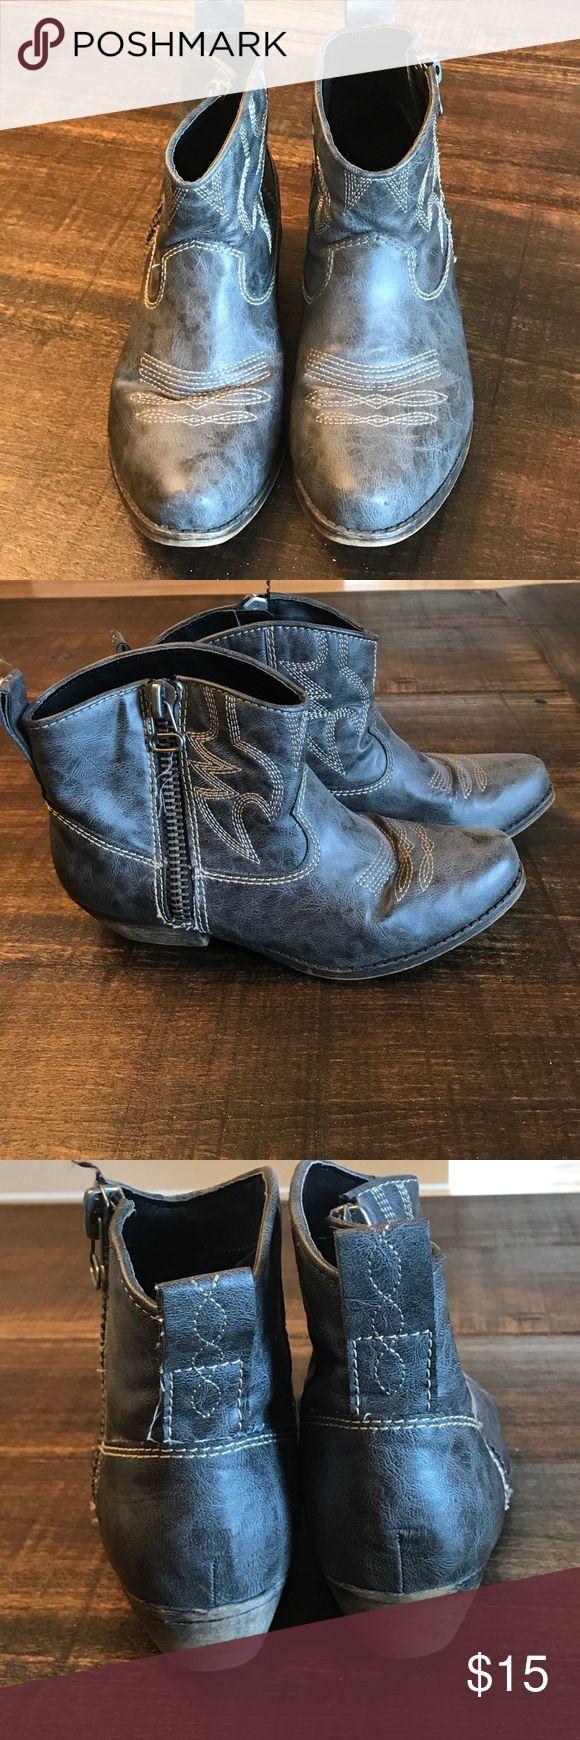 Black vintage ankle boots Black vintage ankle boots Big Buddha Shoes Ankle Boots & Booties